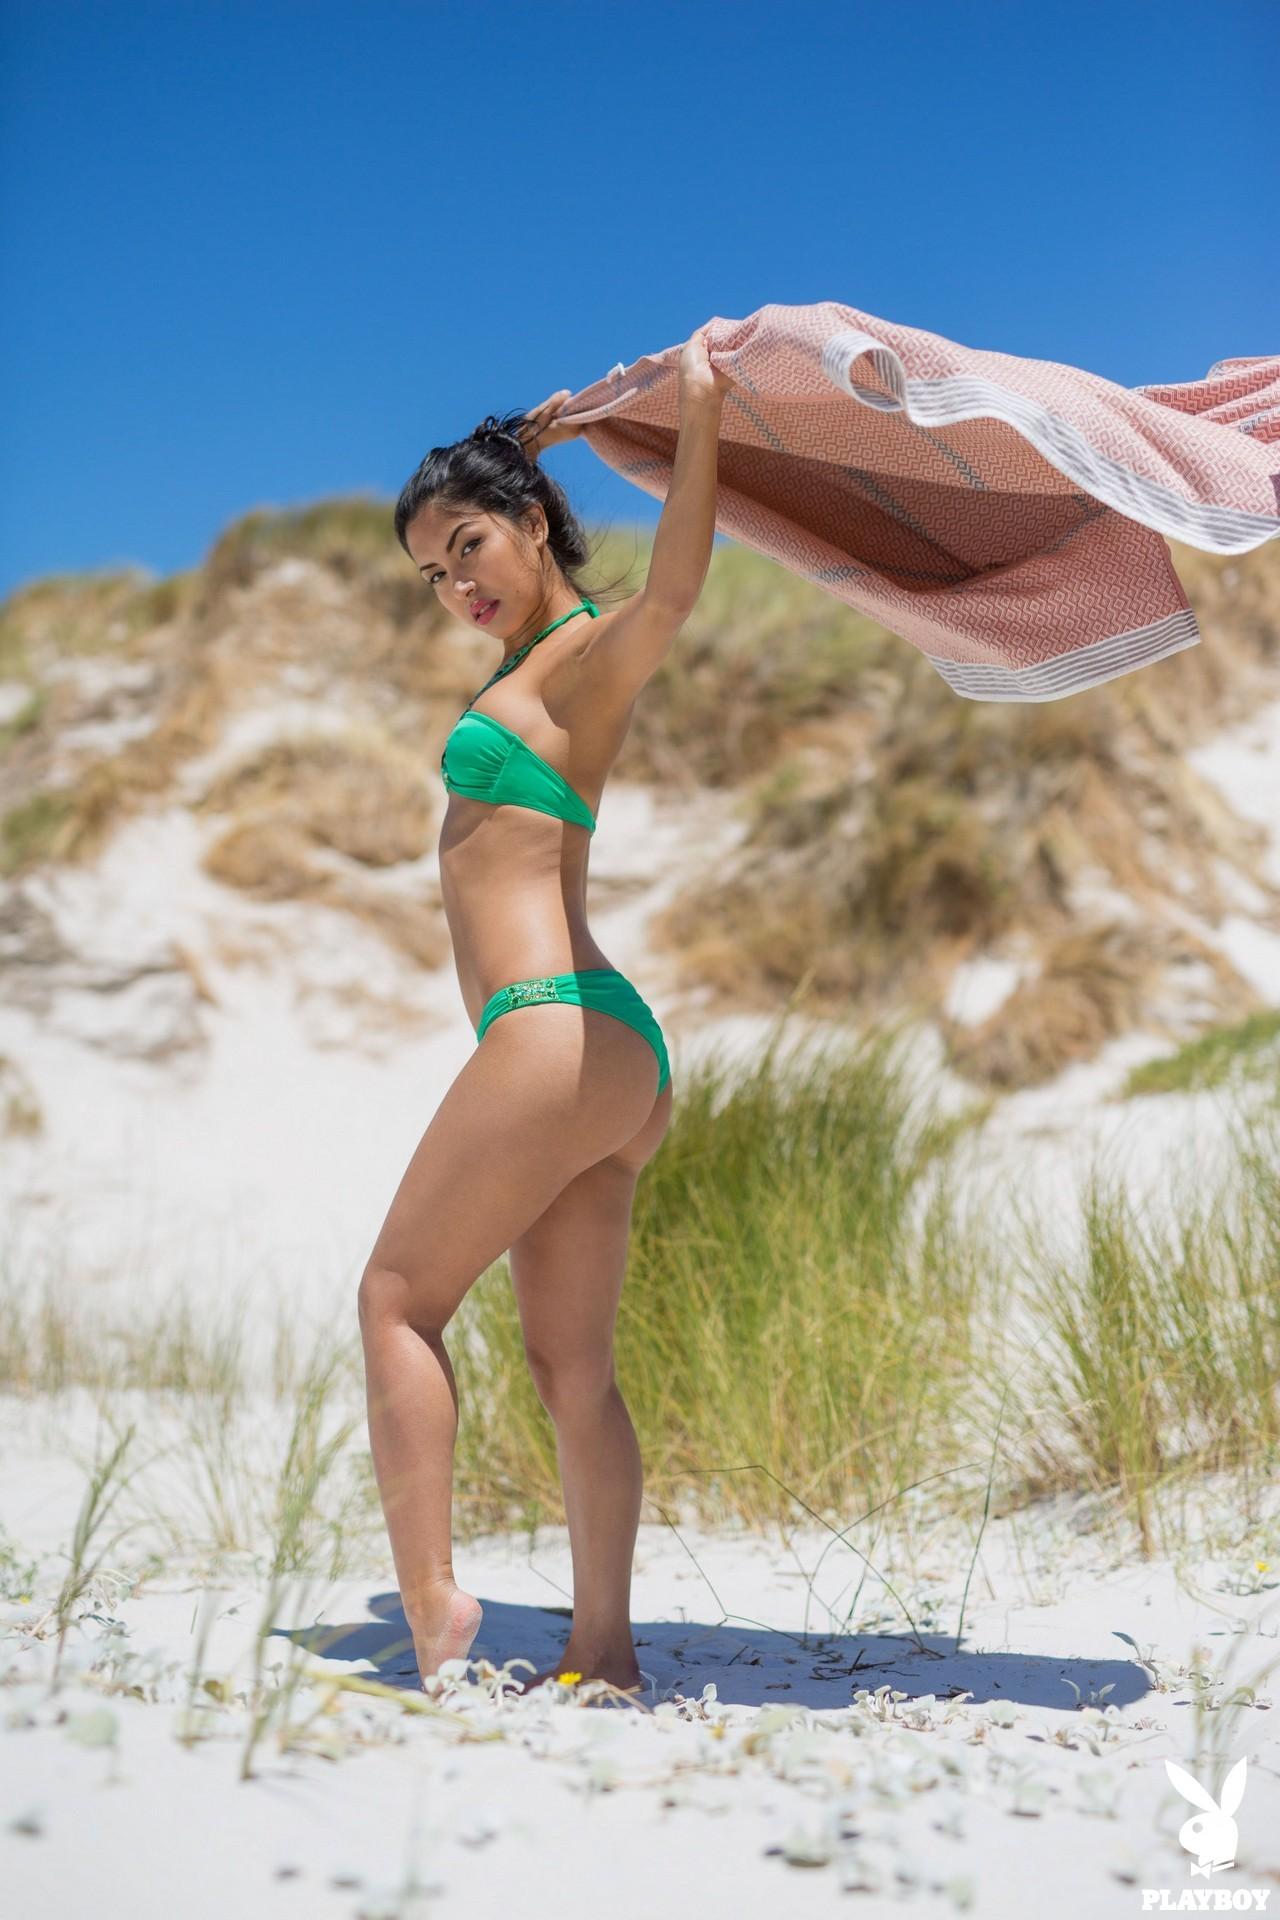 Chloe Rose in  Breezy Paradise - Playboy Plus 32